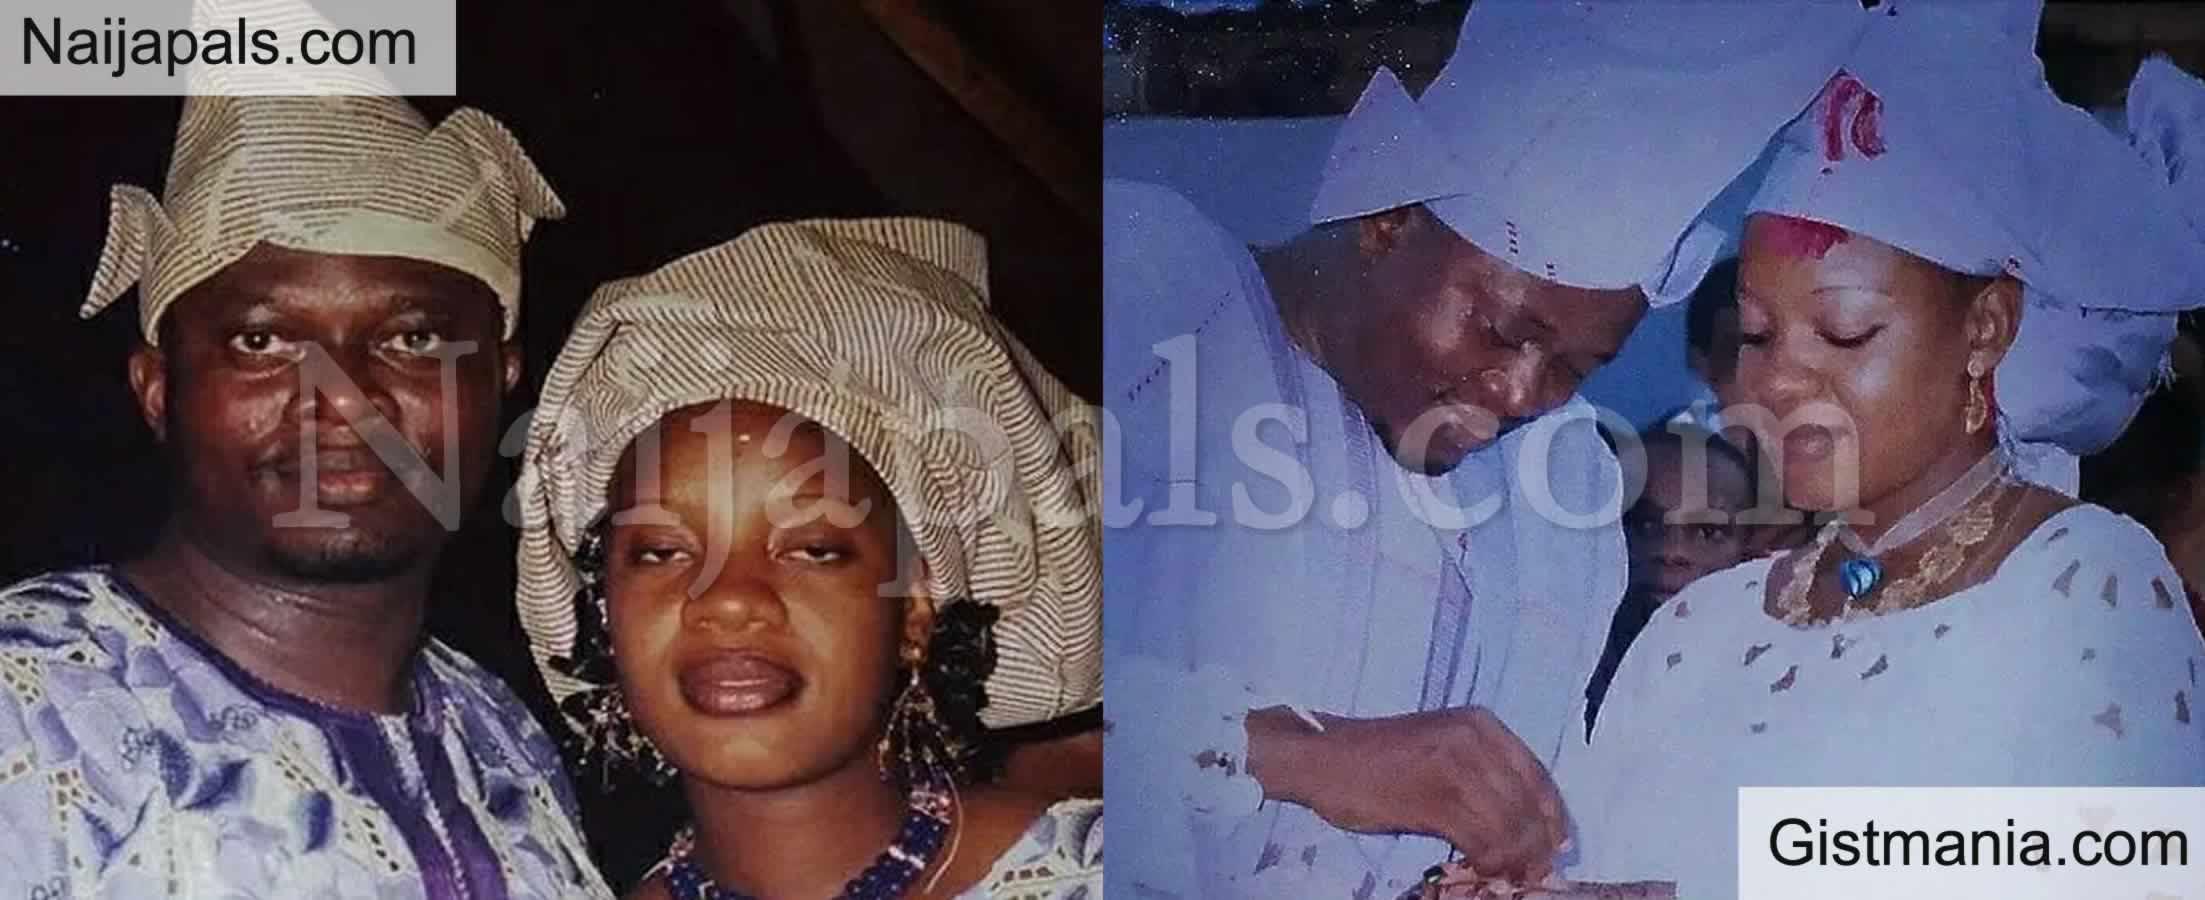 <img alt='.' class='lazyload' data-src='https://img.gistmania.com/emot/love.gif' /><img alt='.' class='lazyload' data-src='https://img.gistmania.com/emot/comment.gif' /><b>15 + 4 Years Is So Worthy With You – Muyiwa Ademola Celebrates Wife On Wedding Anniversary</b>